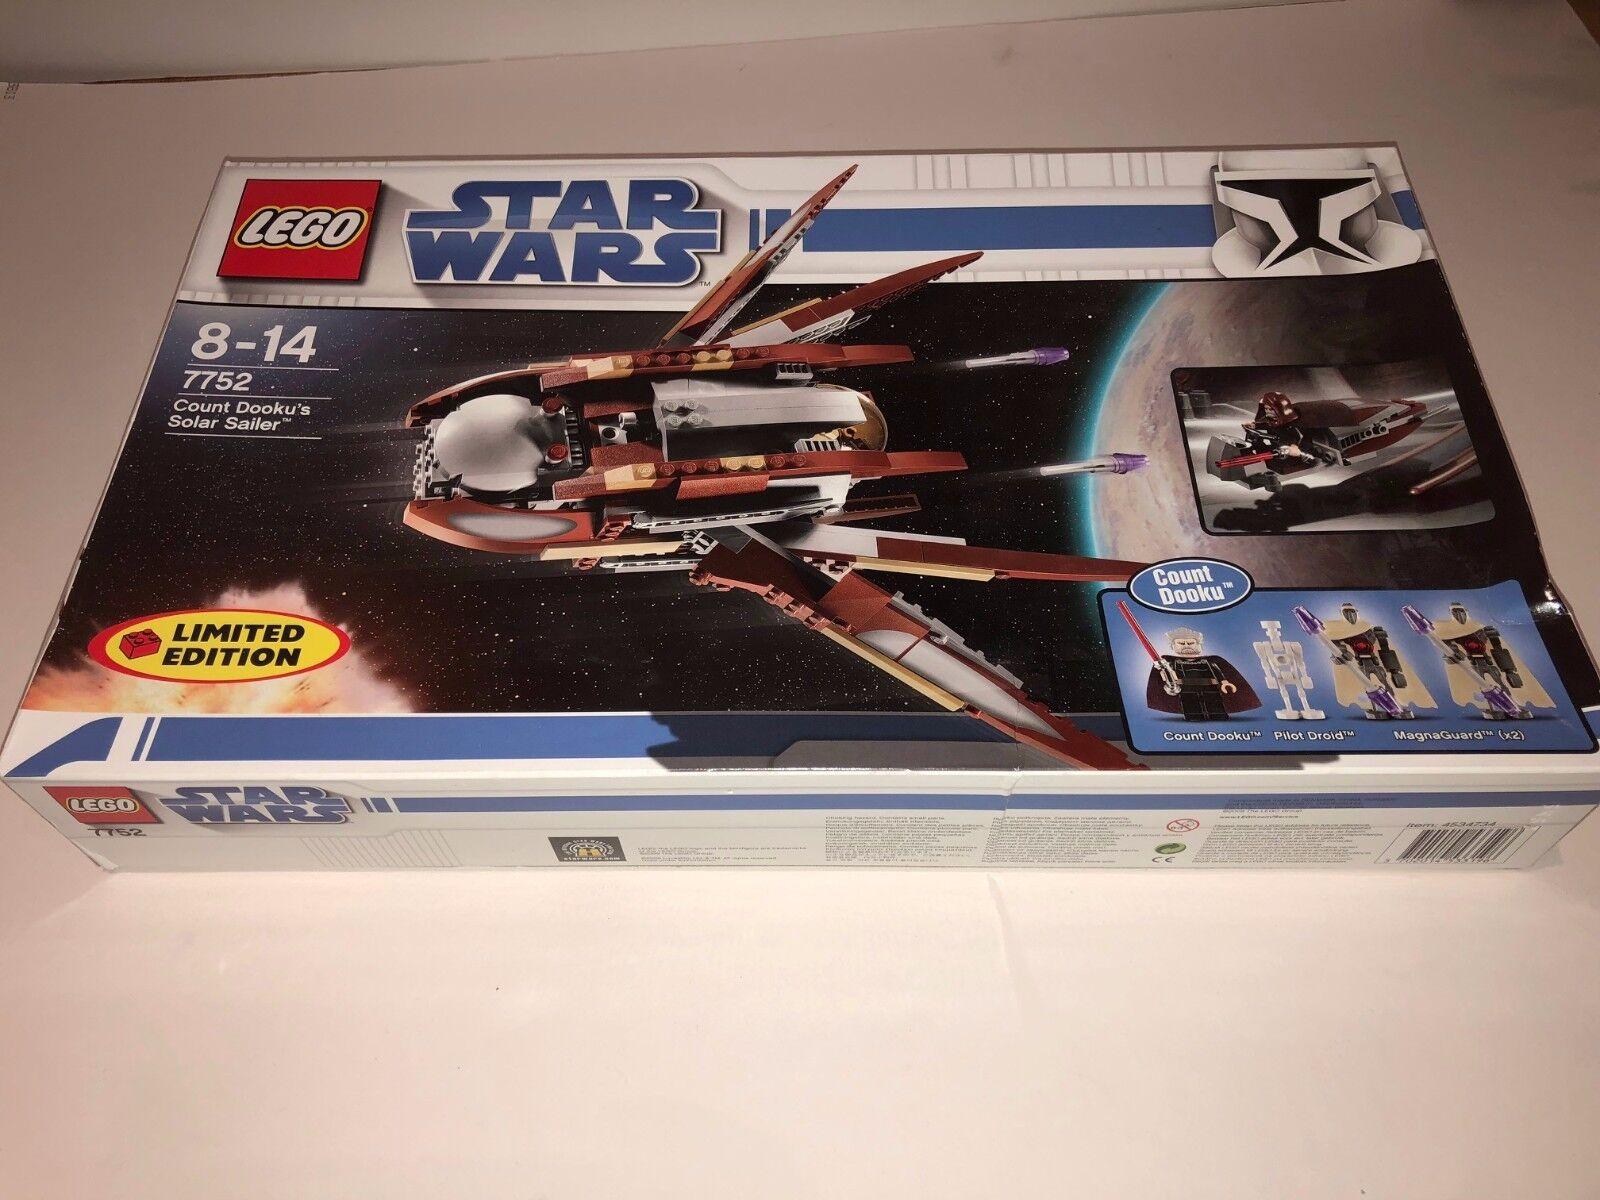 LEGO Star Wars Count Dooku's Solar Sailer 7752 - Factory Sealed BNIB